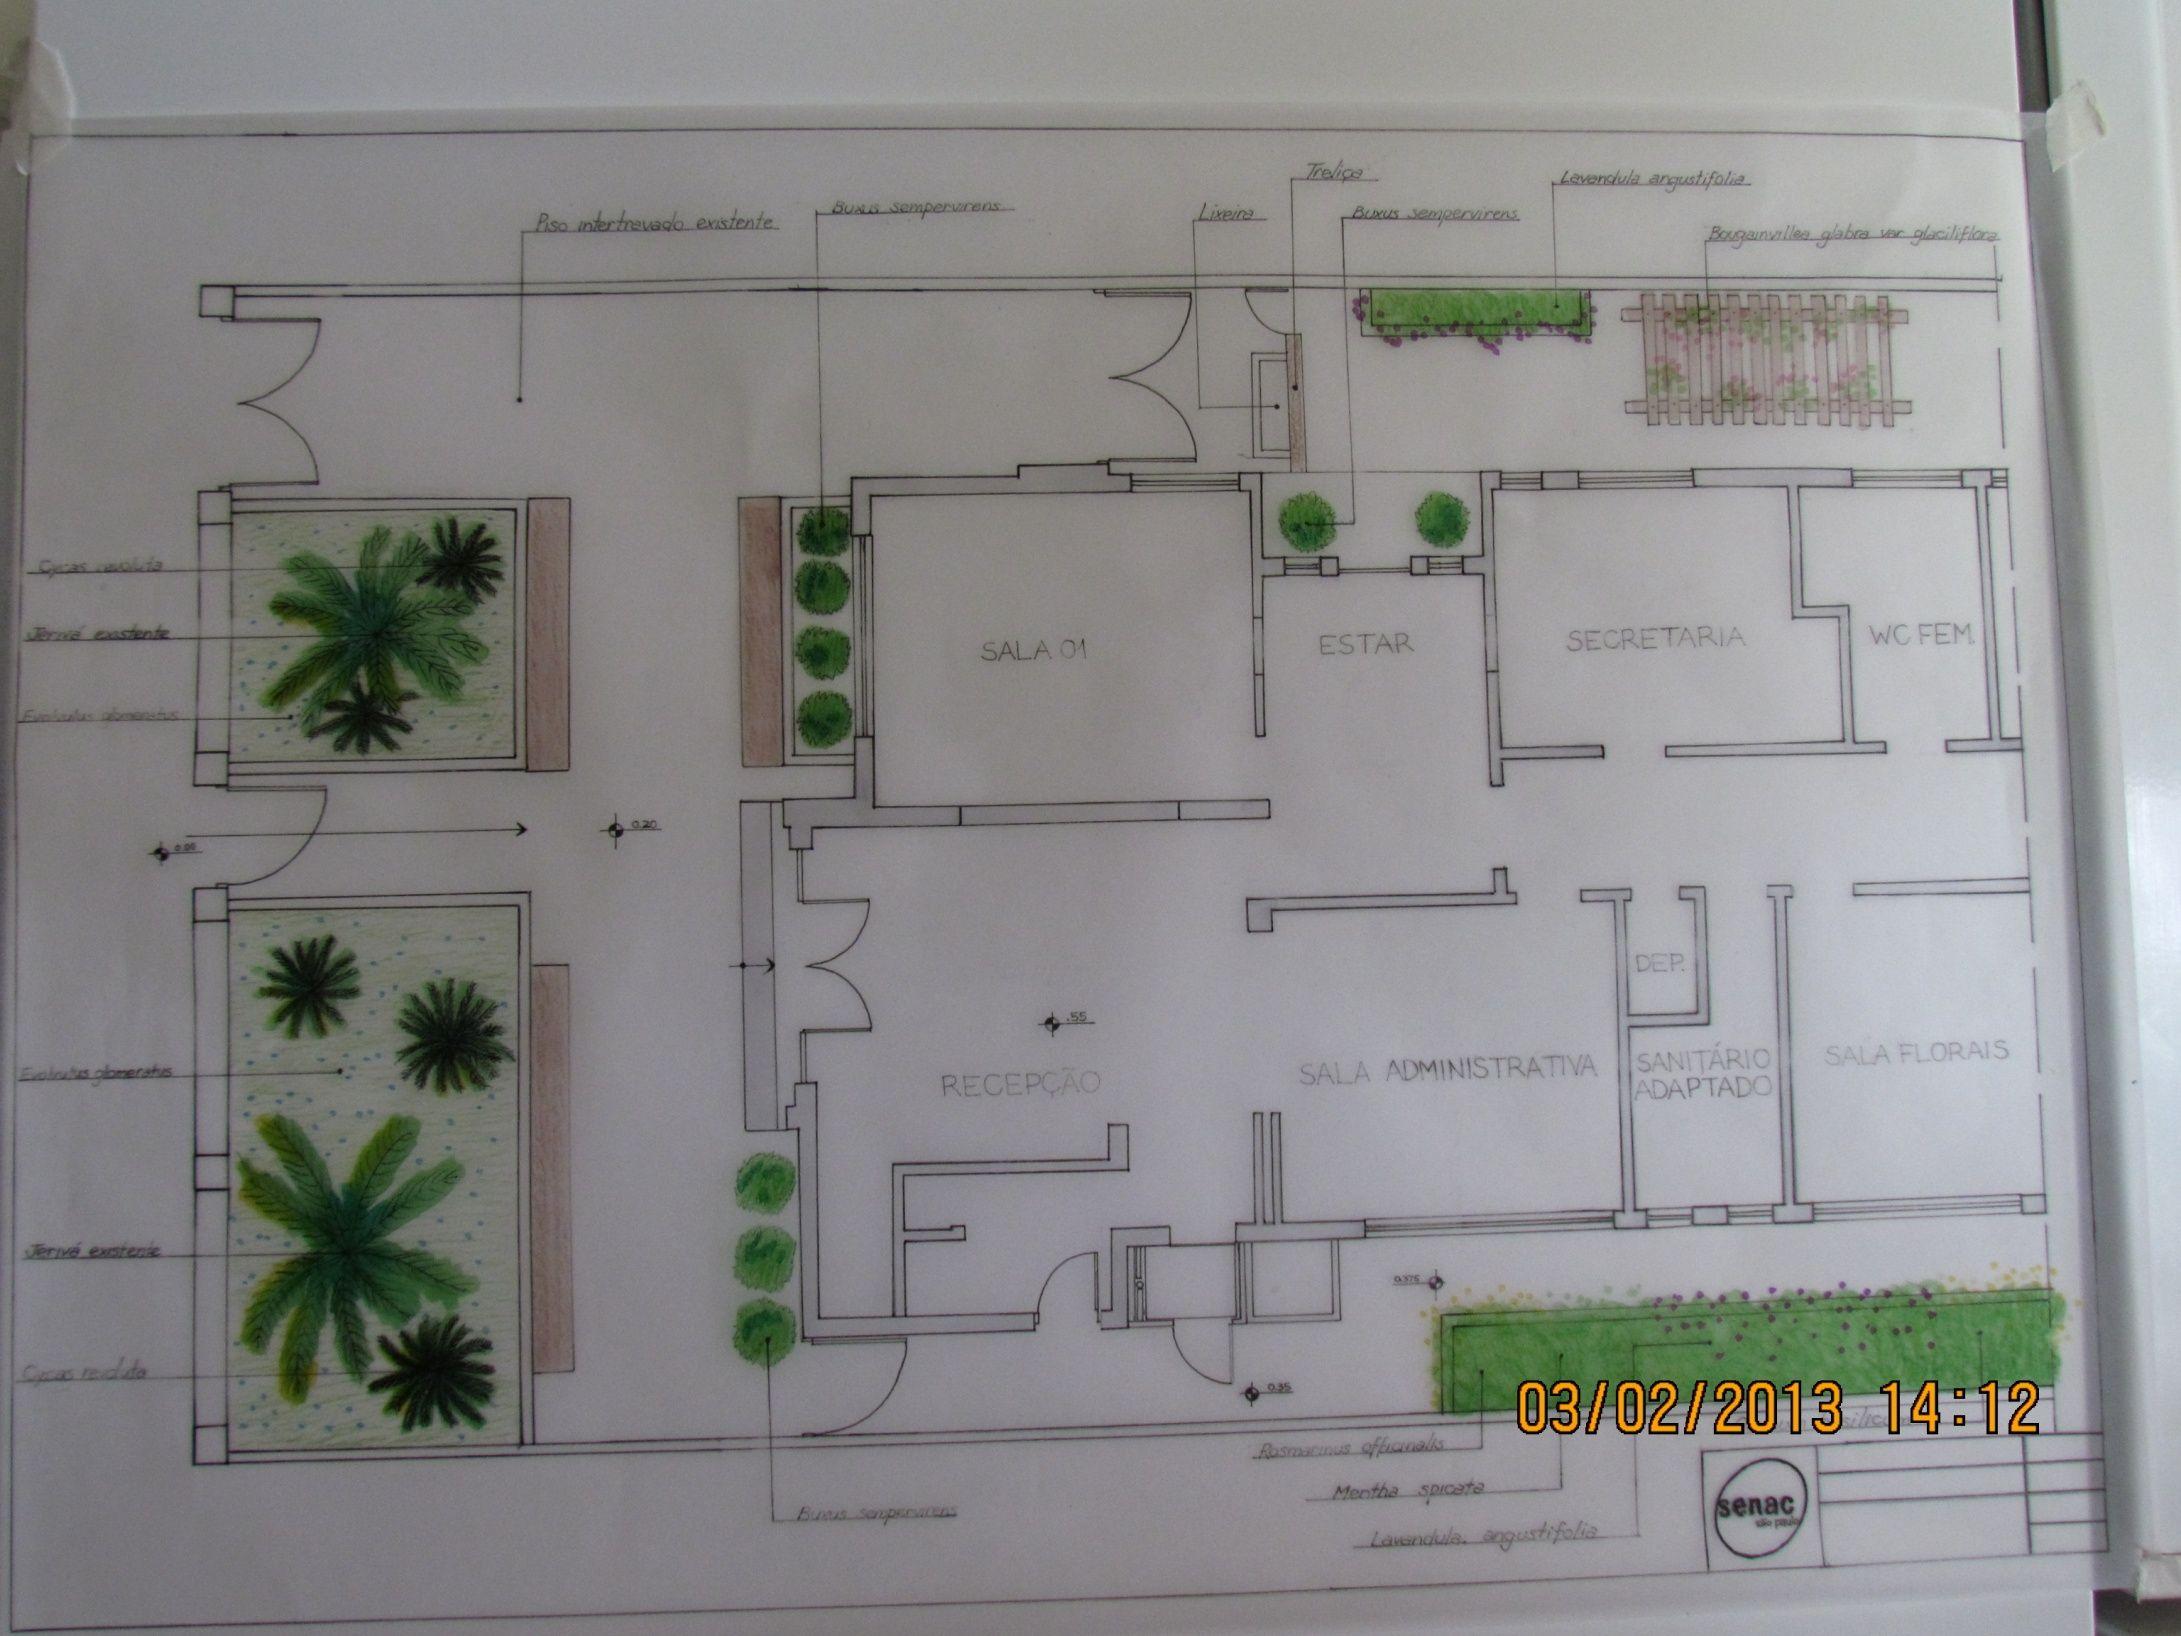 Projeto De Paisagismo Planta Baixa Senac Por Juliana Moreno